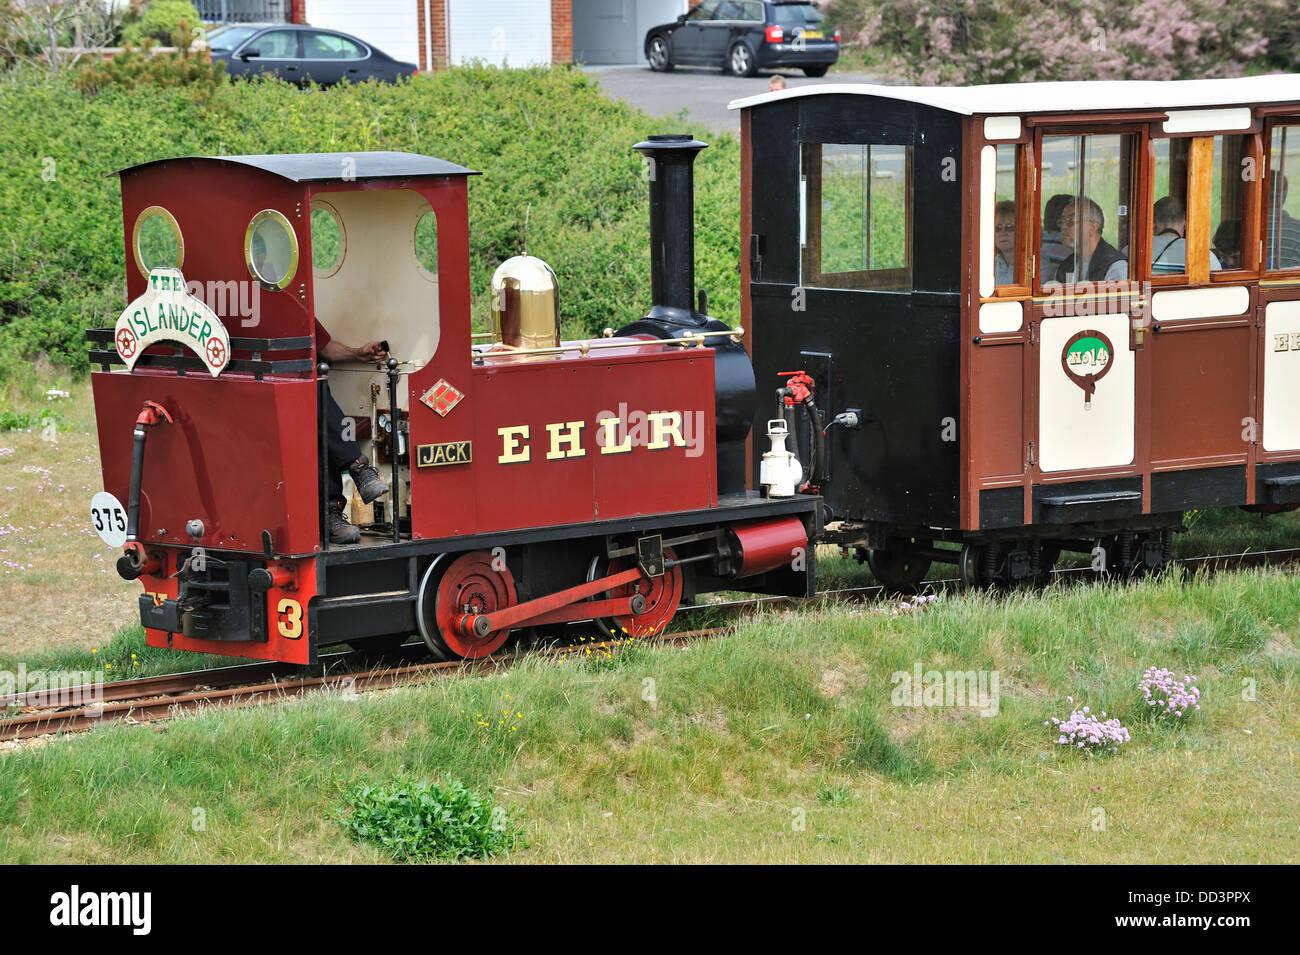 Tren de trocha angosta de Hayling paseo ferroviario, Hayling Island, Hampshire, Reino Unido Foto de stock